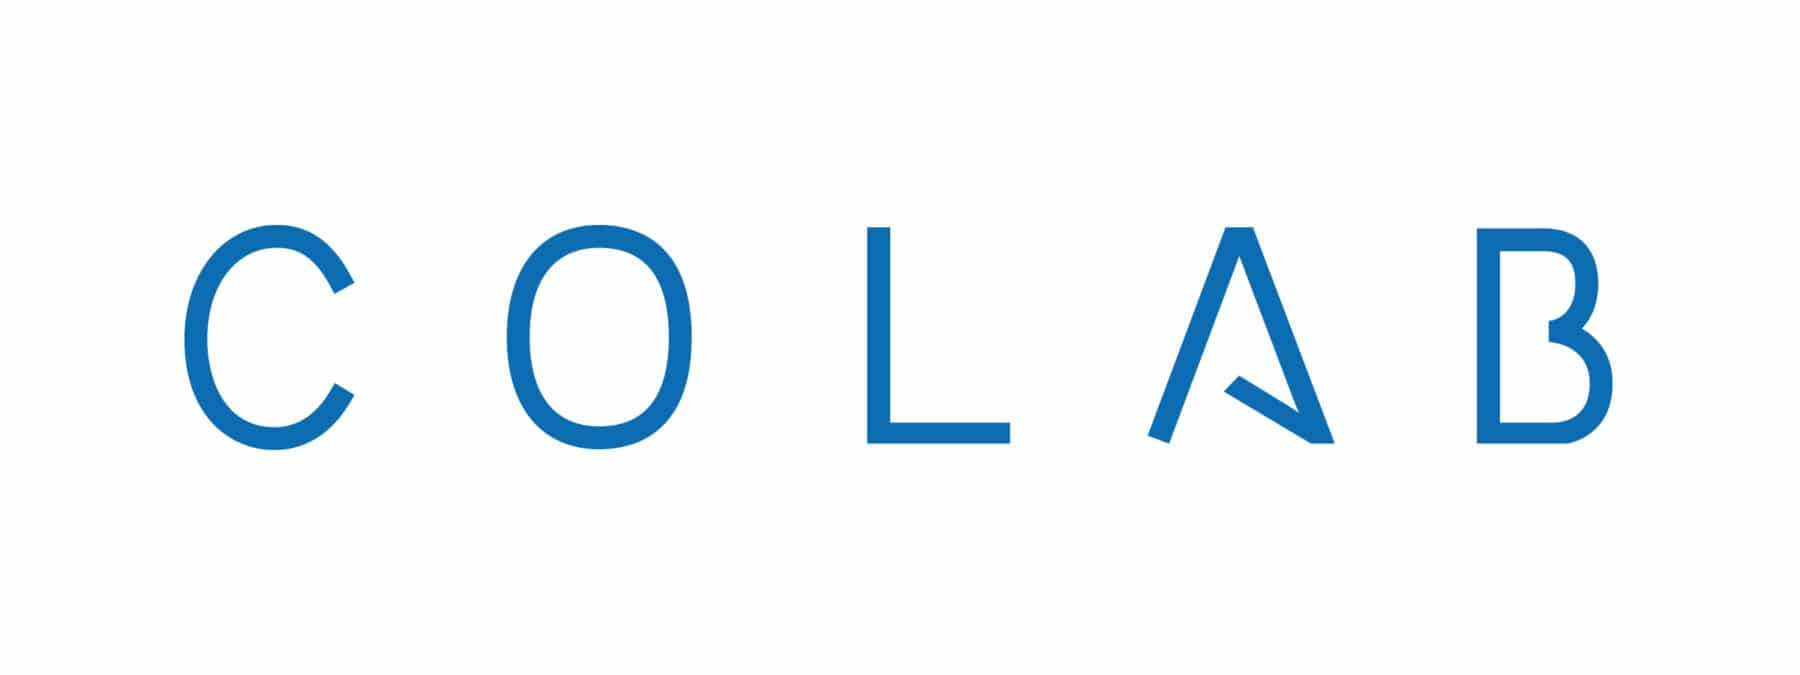 Co-Lab logo